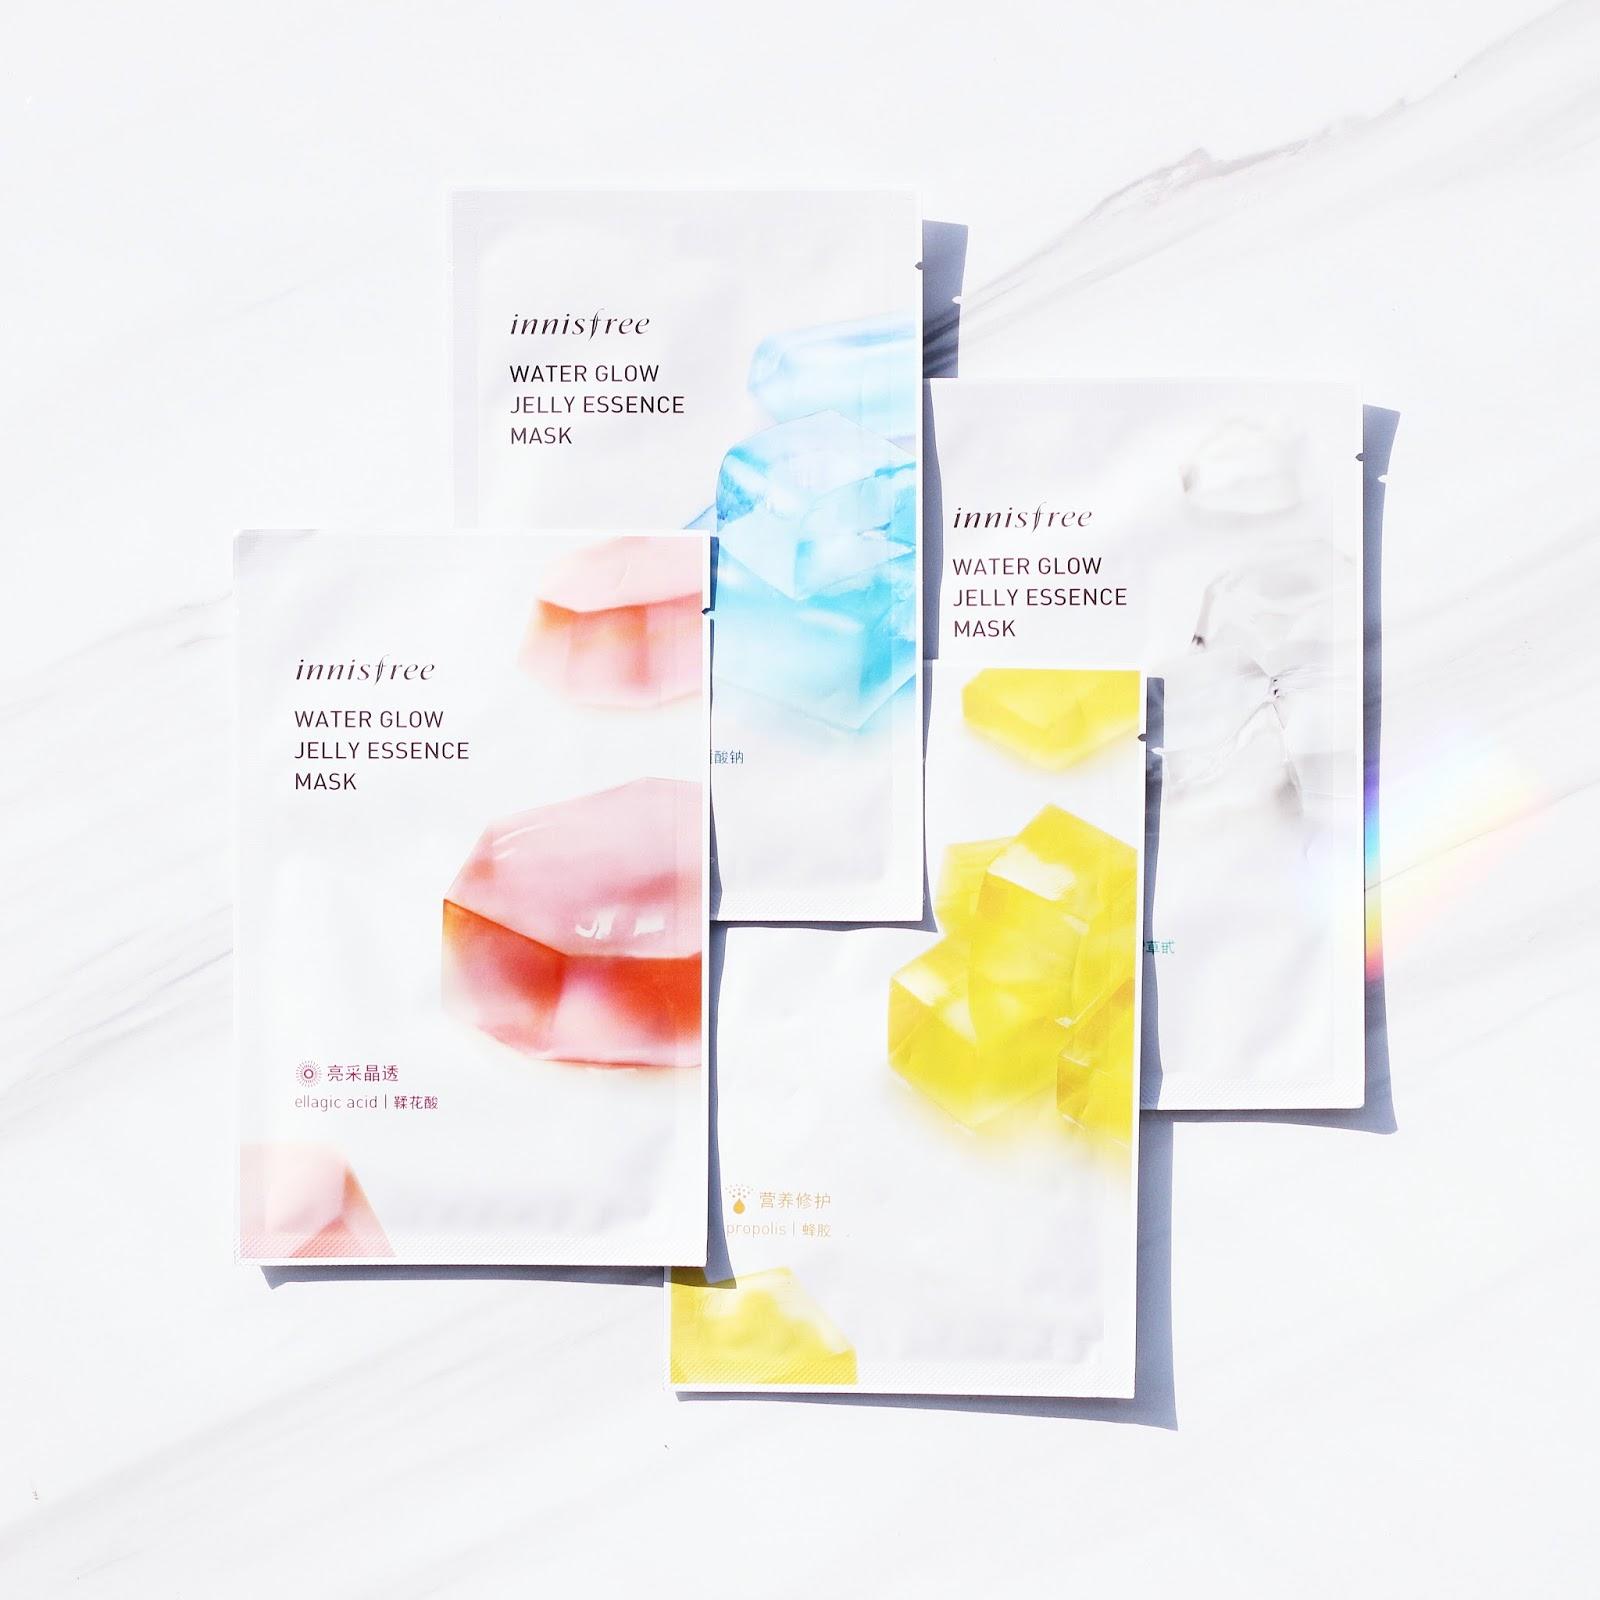 Innisfree Water Glow Jelly Essence Mask Review 悦诗风吟 水光果冻面膜